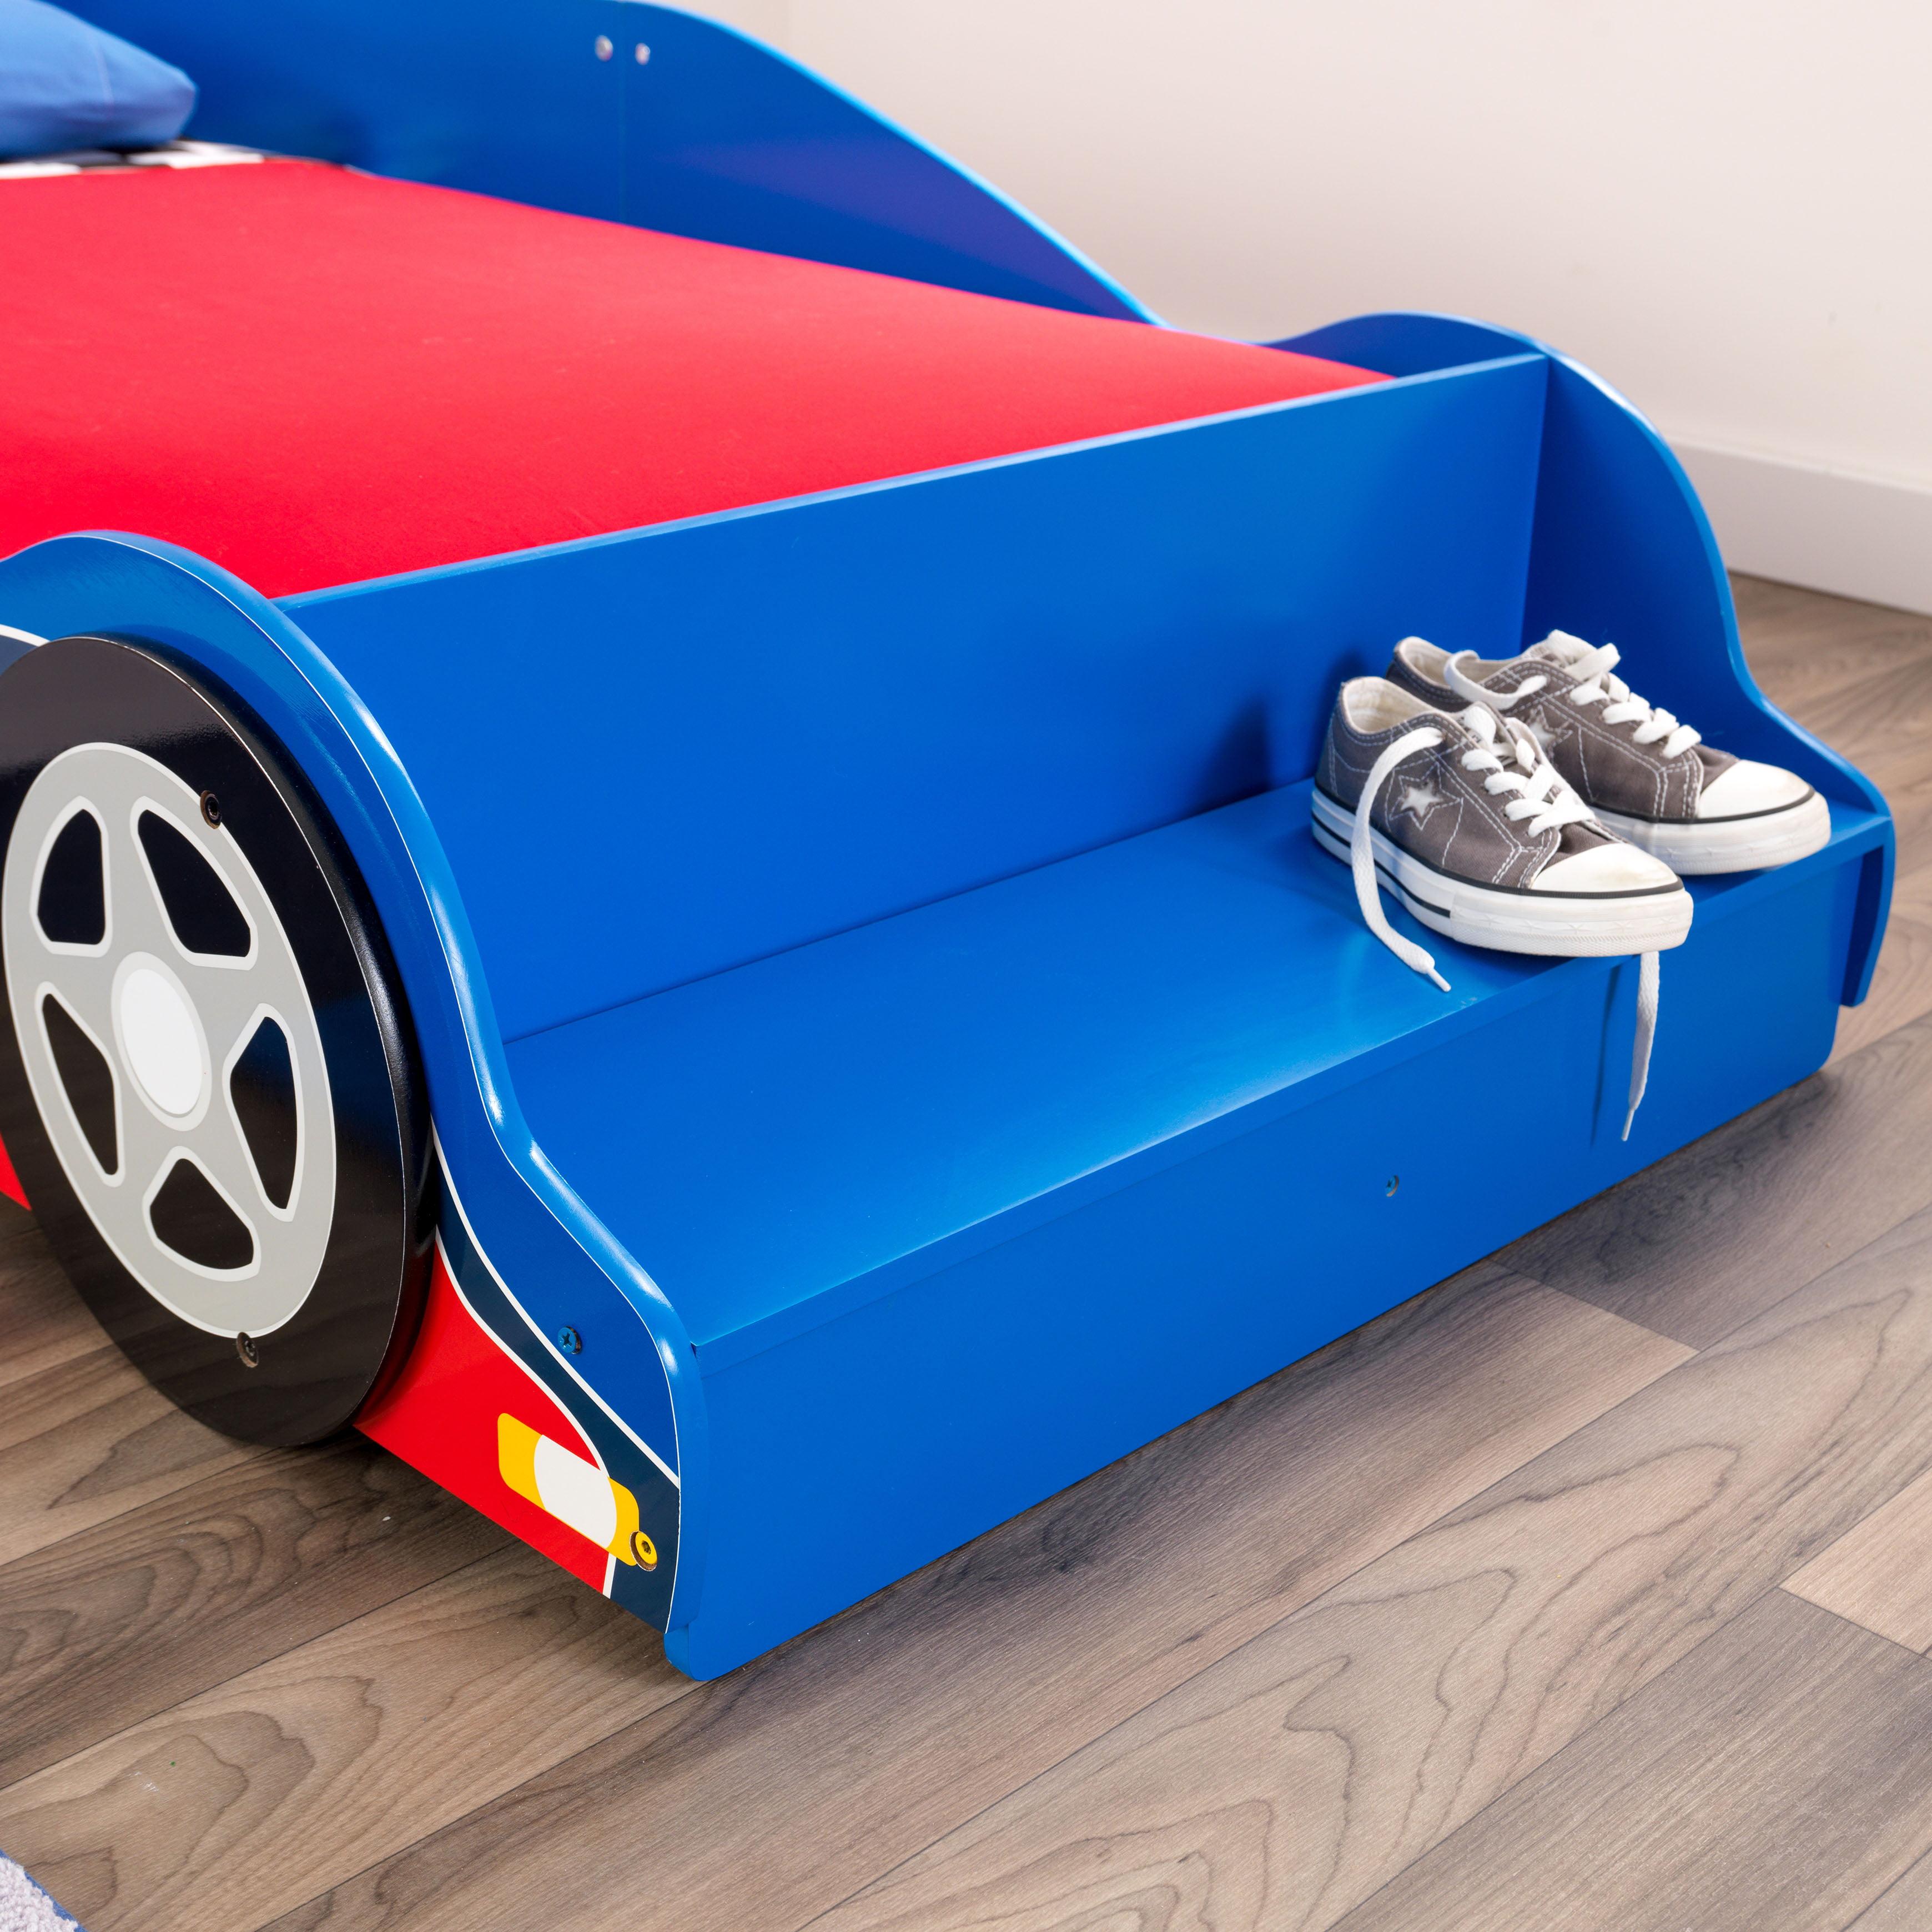 KidKraft Race Car Toddler Bed, Blue and Red - Walmart.com